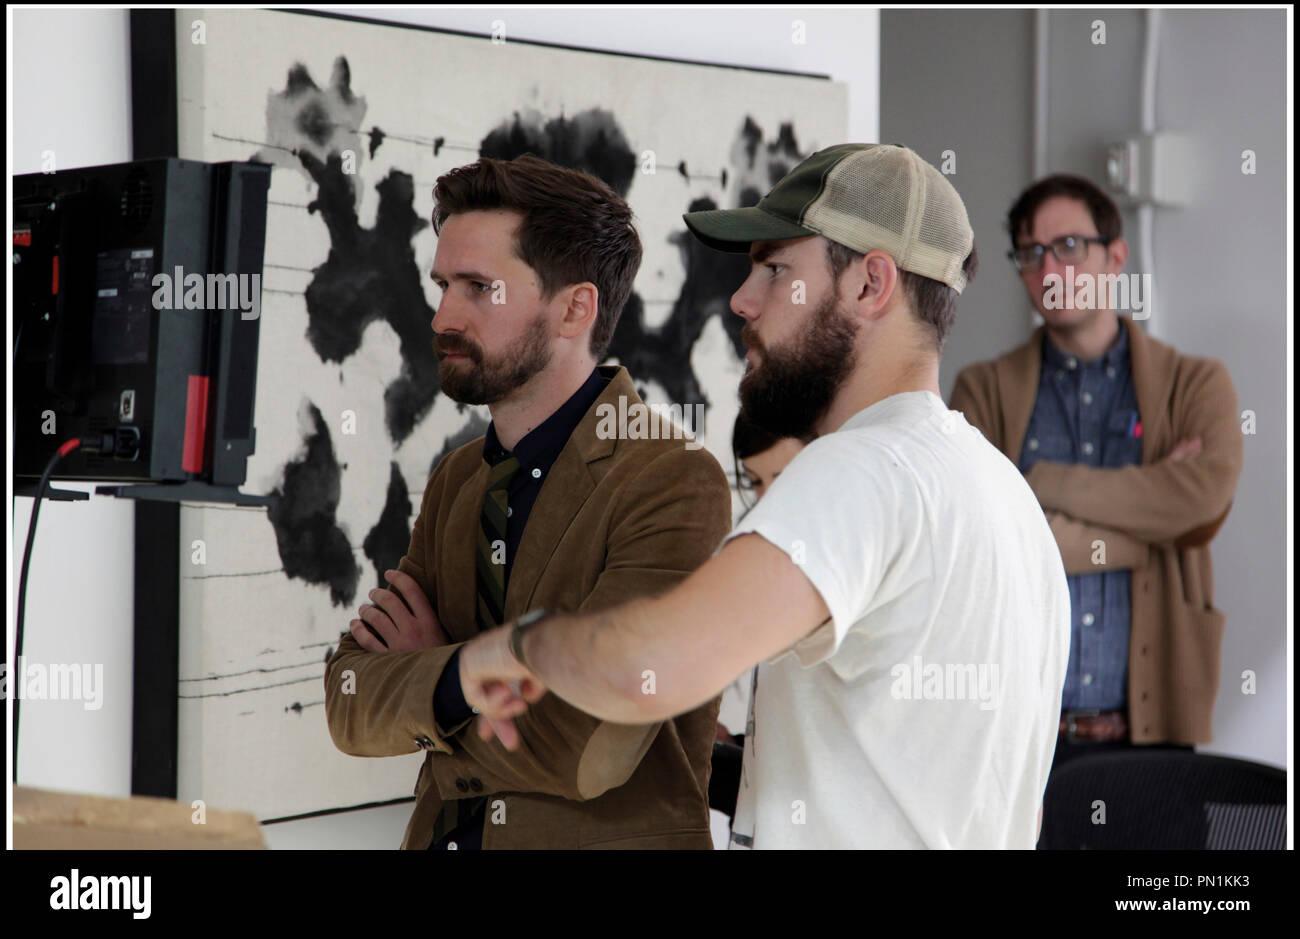 Prod DB © Ghost Robot - Greencard Pictures - Mathematic / DR CREATIVE CONTROL de Benjamin Dickinson 2015 USA avec Benjamin Dickinson (a gauche) sur le tournage - Stock Image